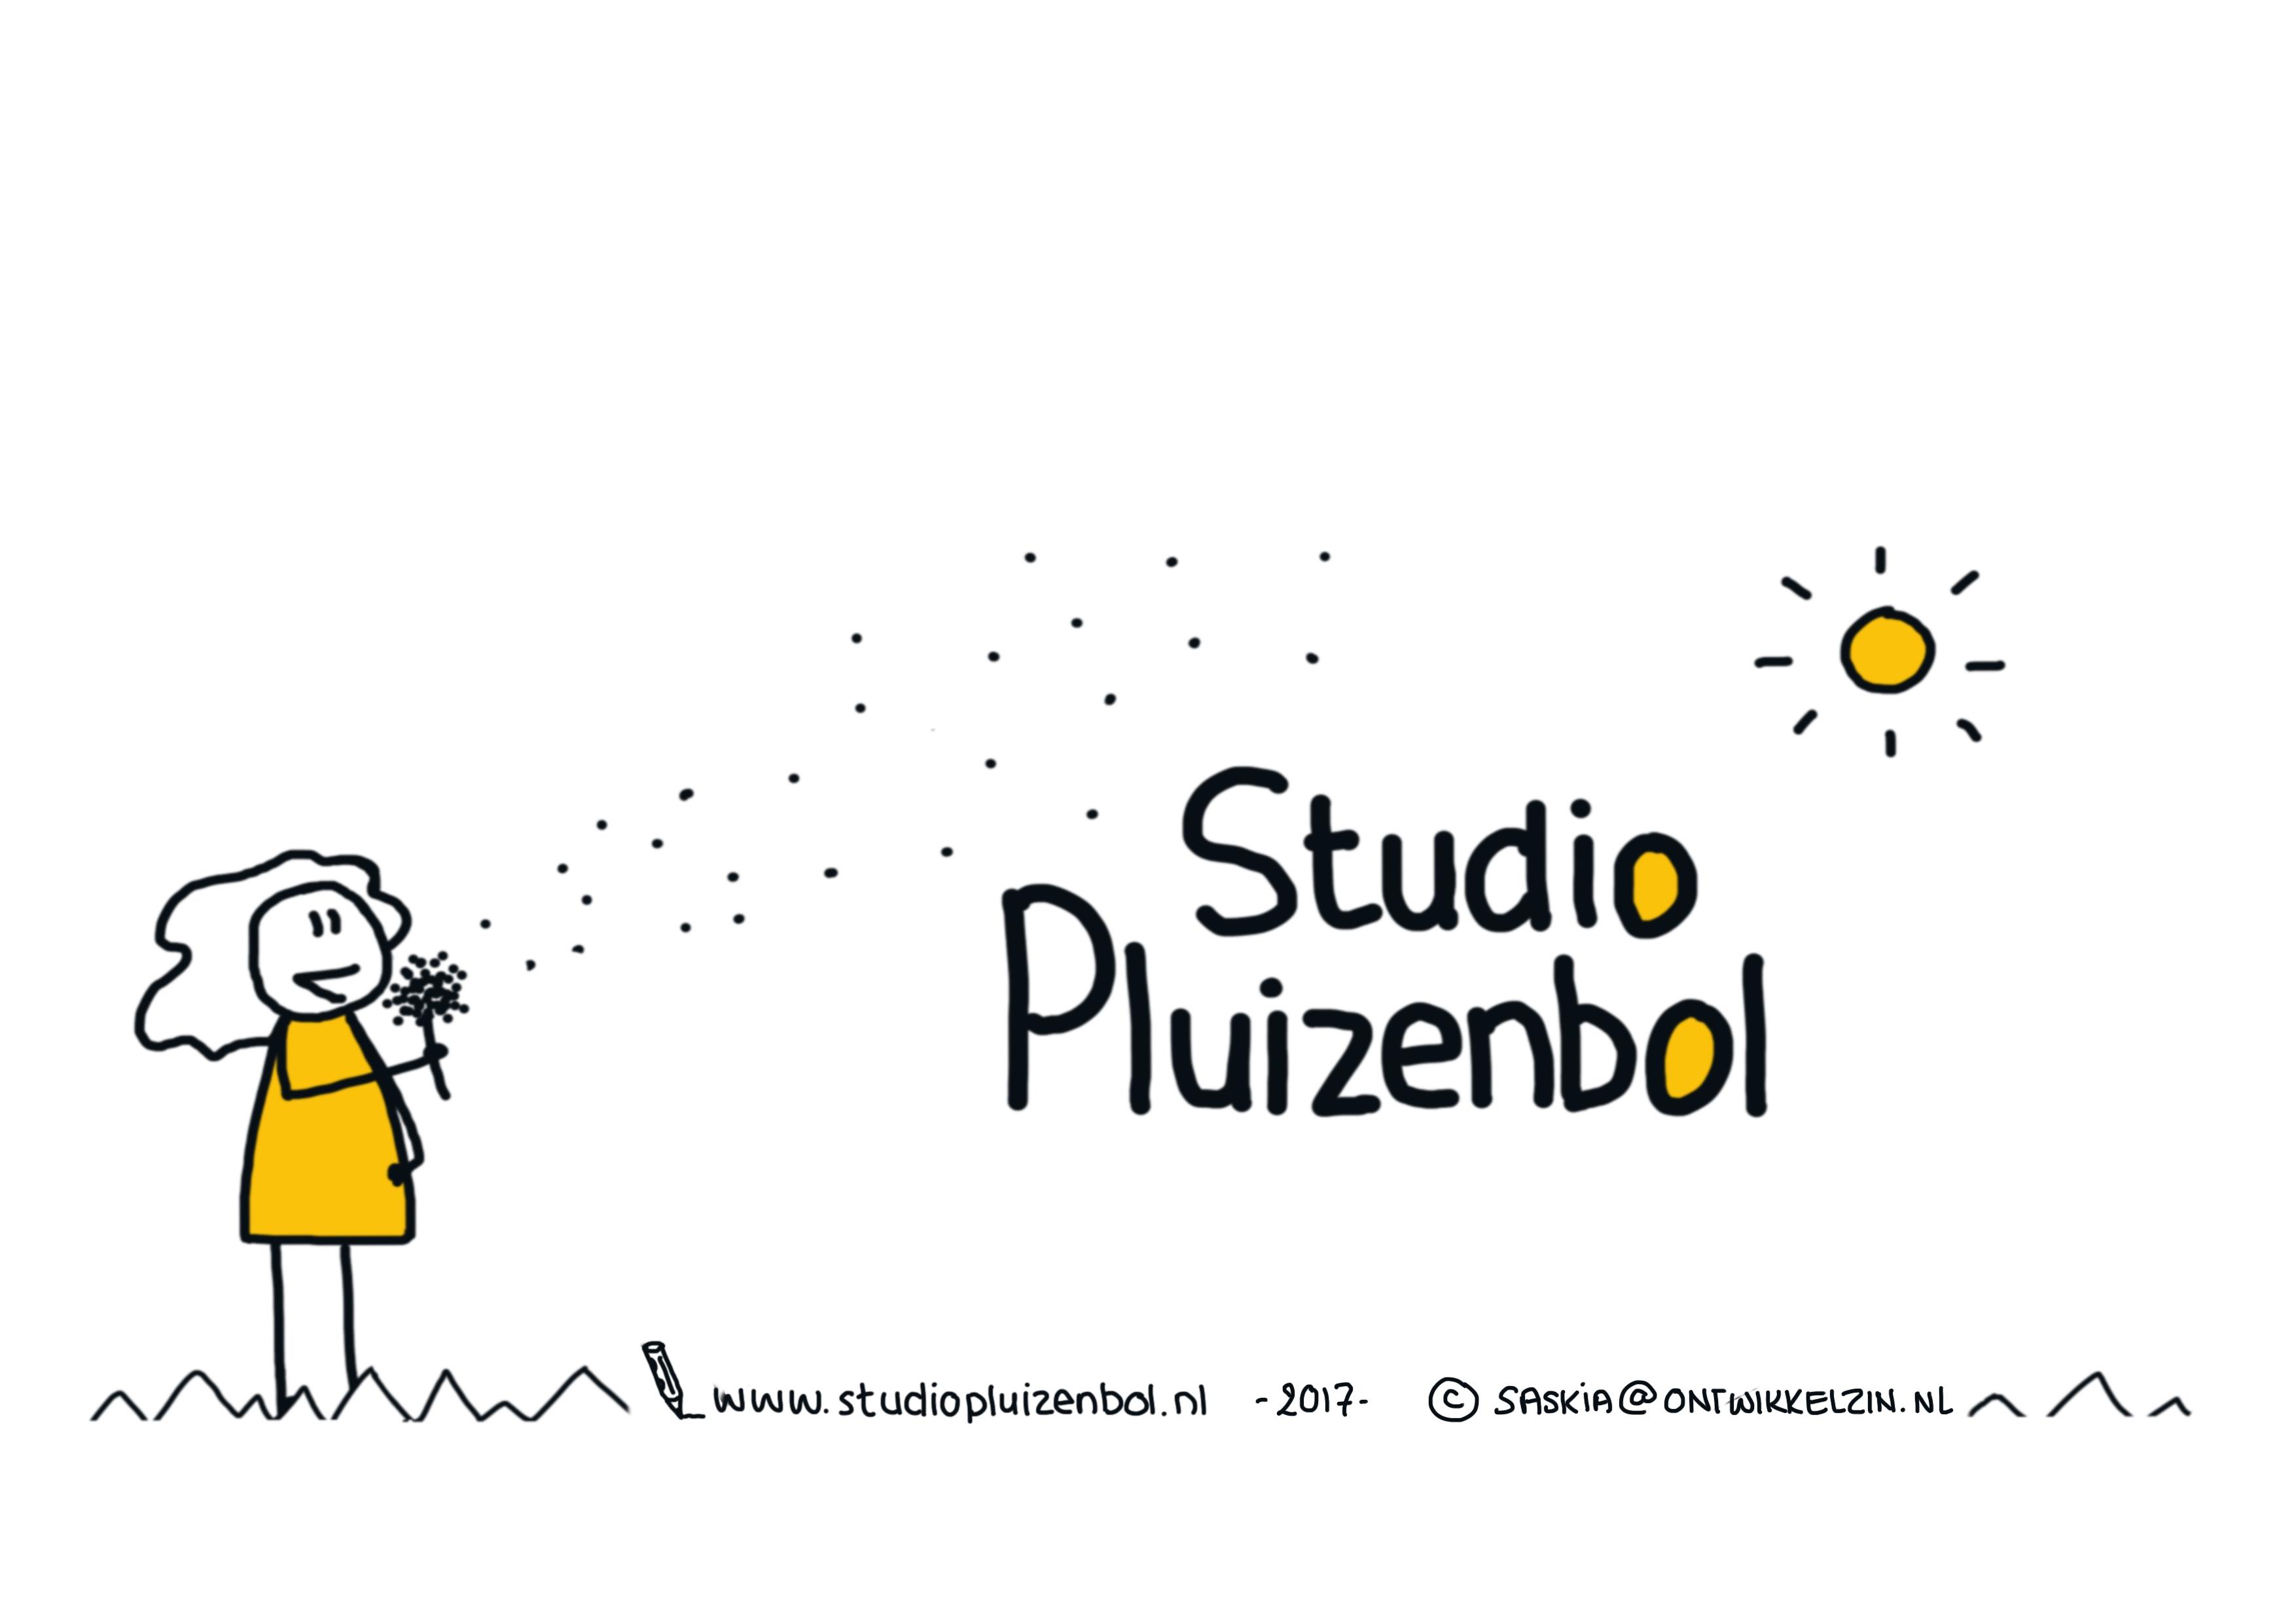 Studio Pluizenbol